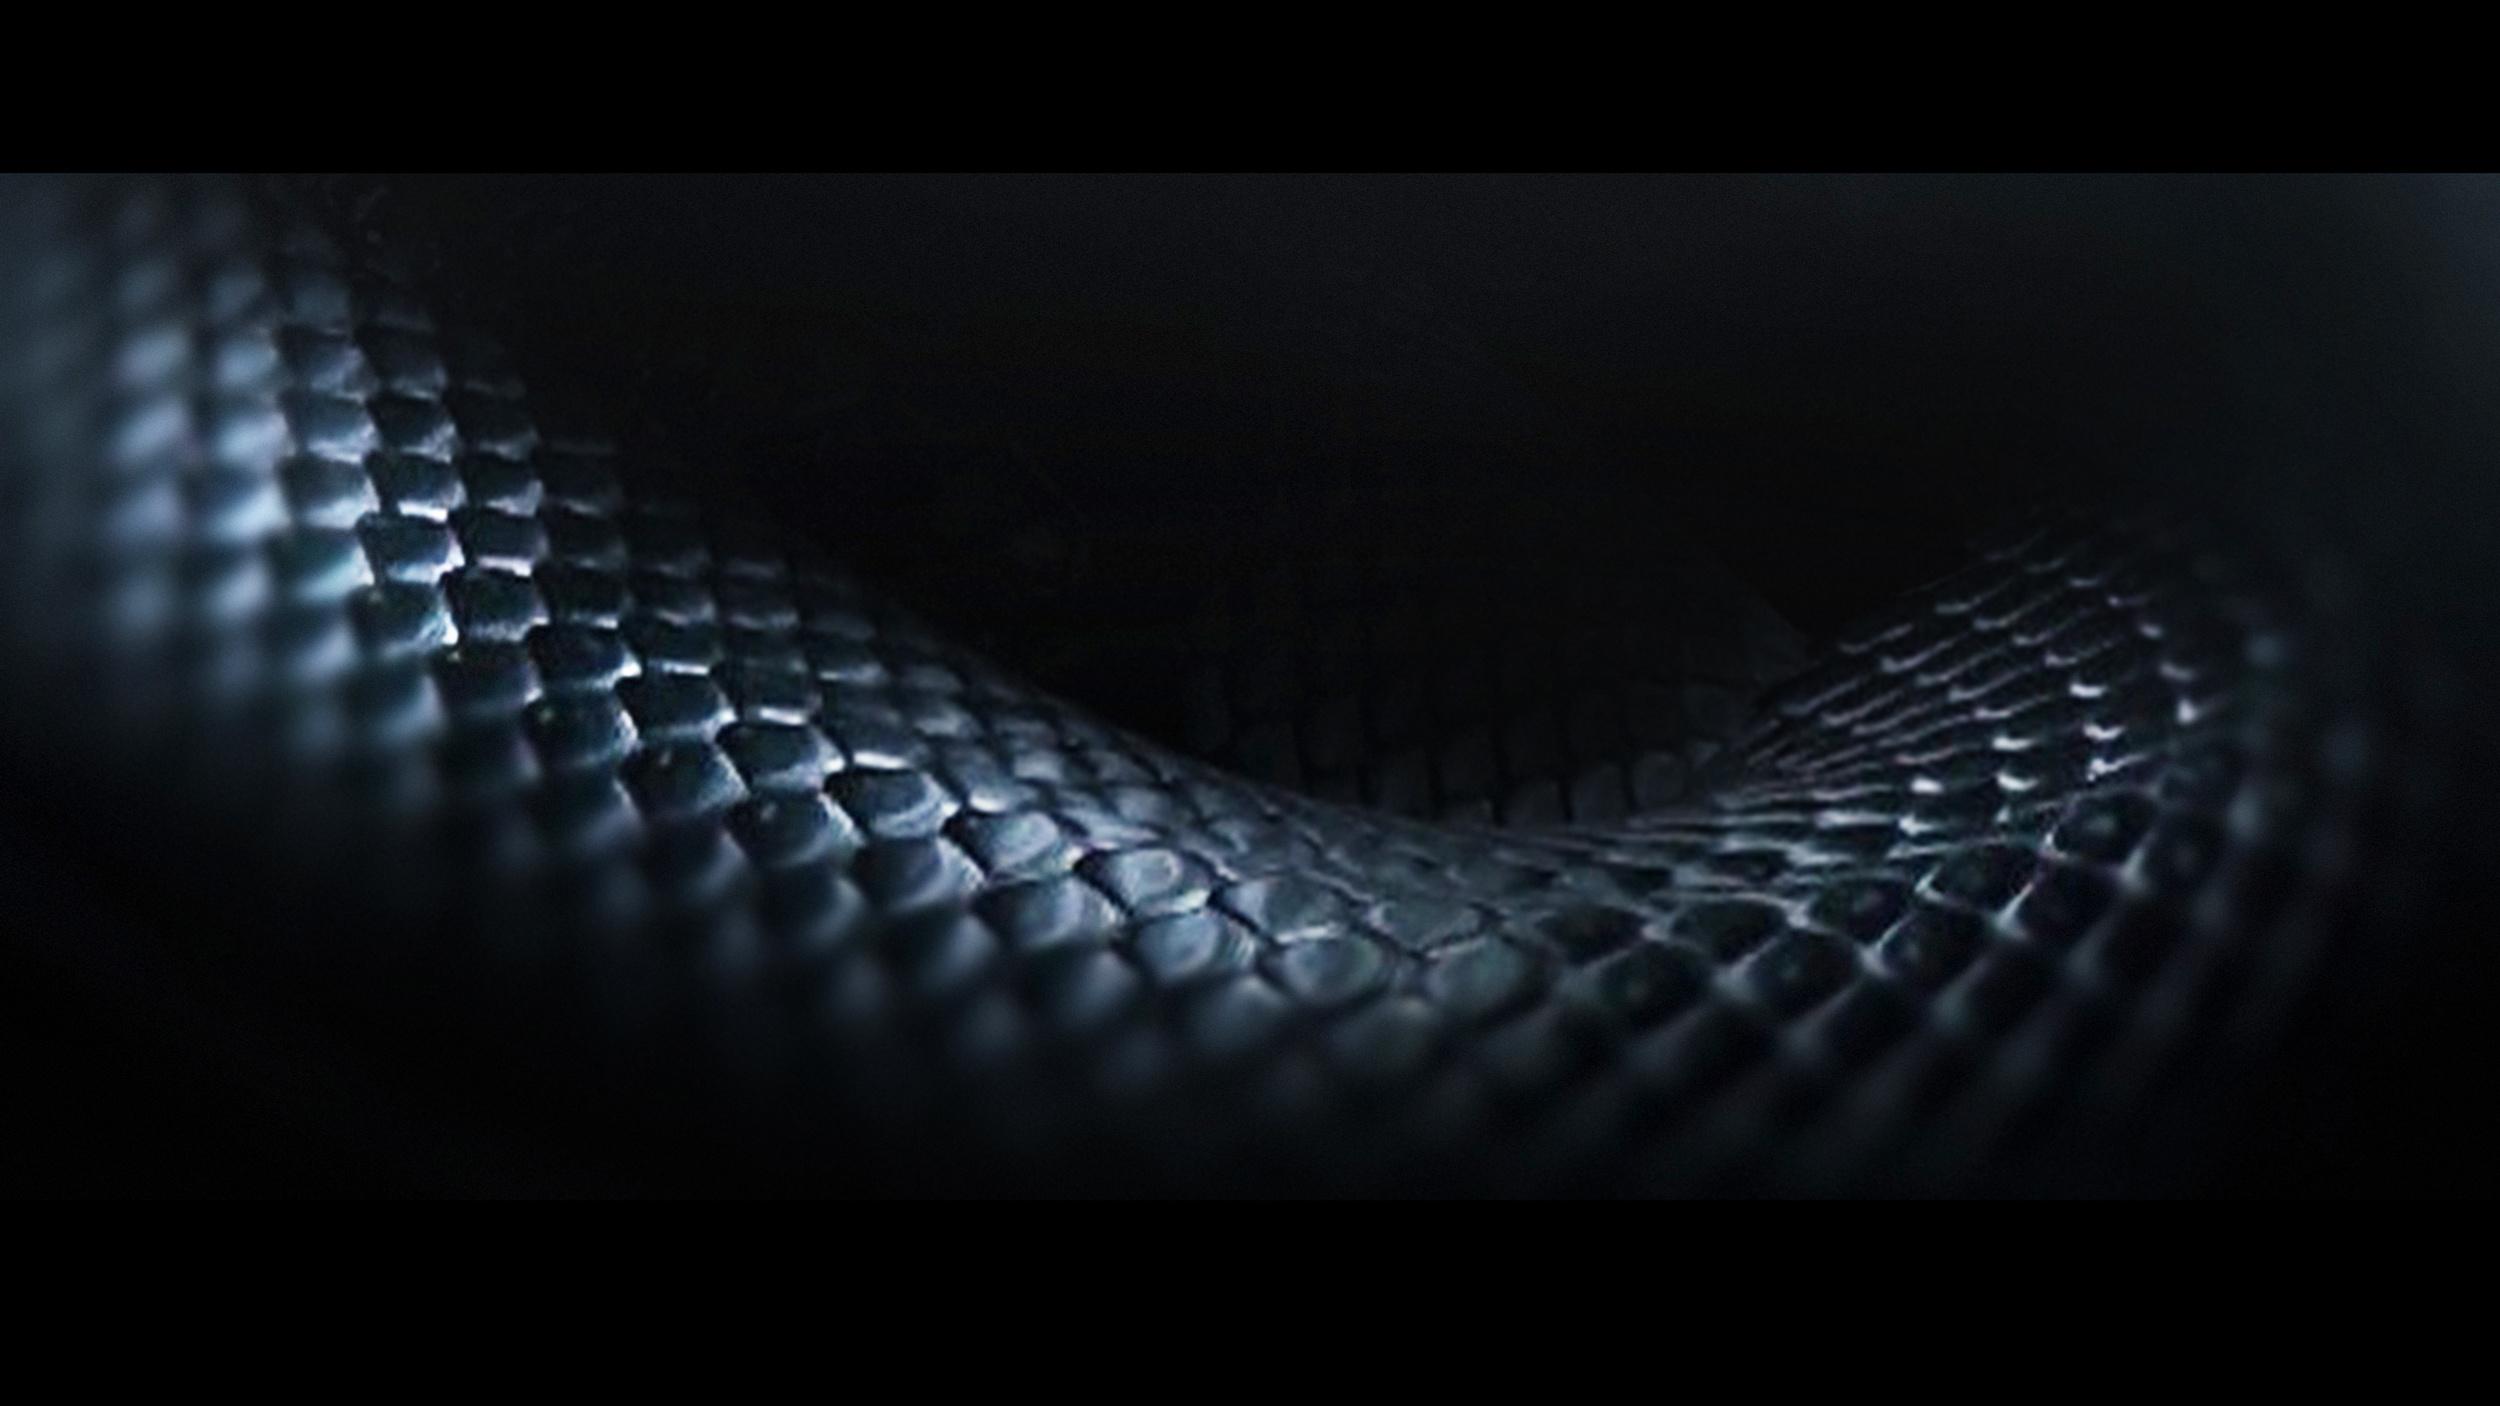 Lauren-Indovina-Penny-Dreadful-Titles-PSYOP-Concept-Art-Snake-3.jpg